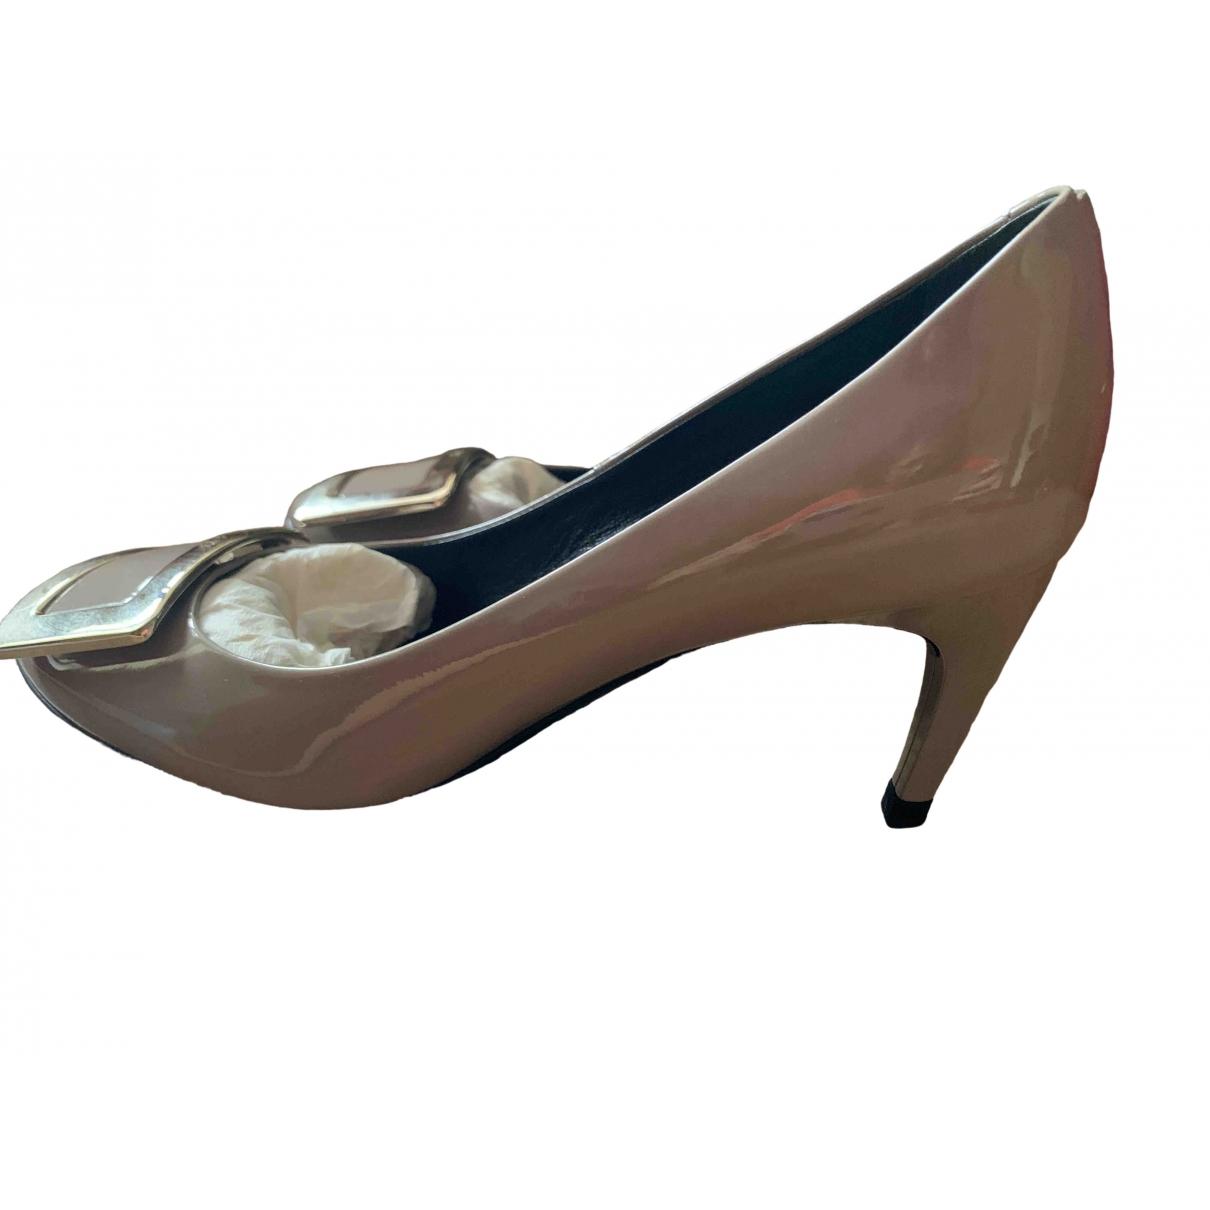 Roger Vivier Belle de Nuit Grey Patent leather Heels for Women 36 EU